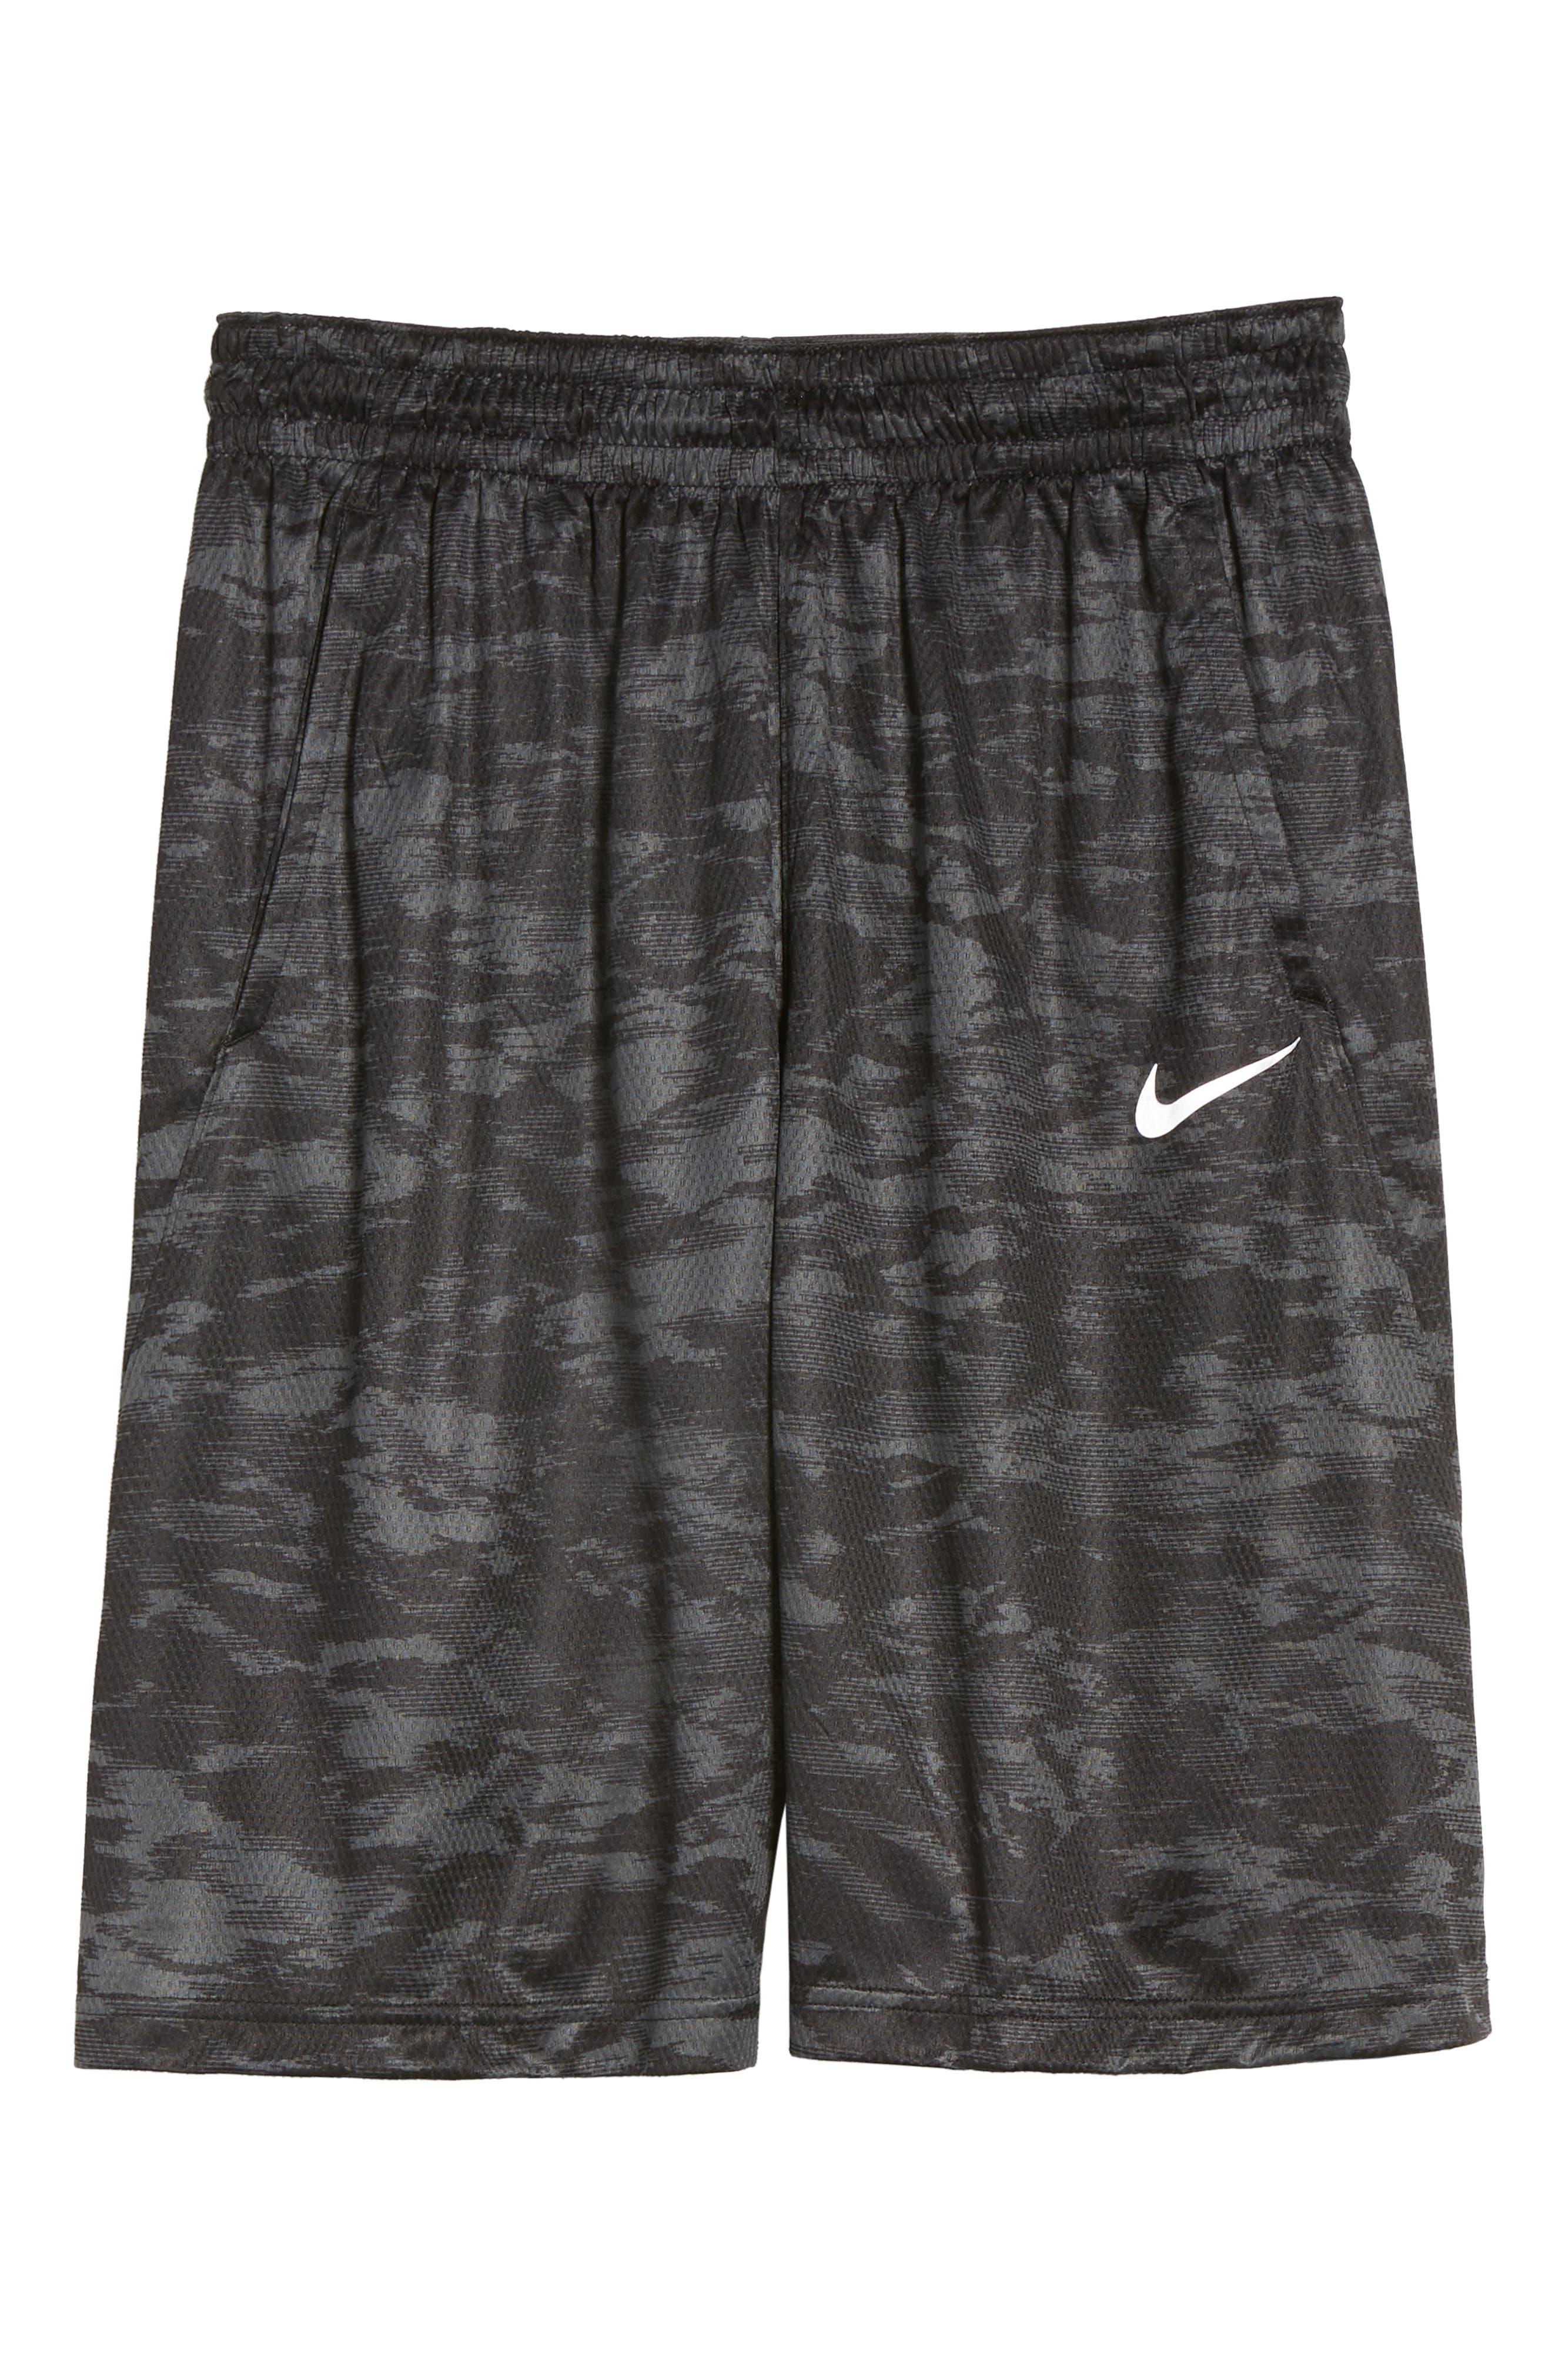 Dry Basketball Shorts,                             Alternate thumbnail 16, color,